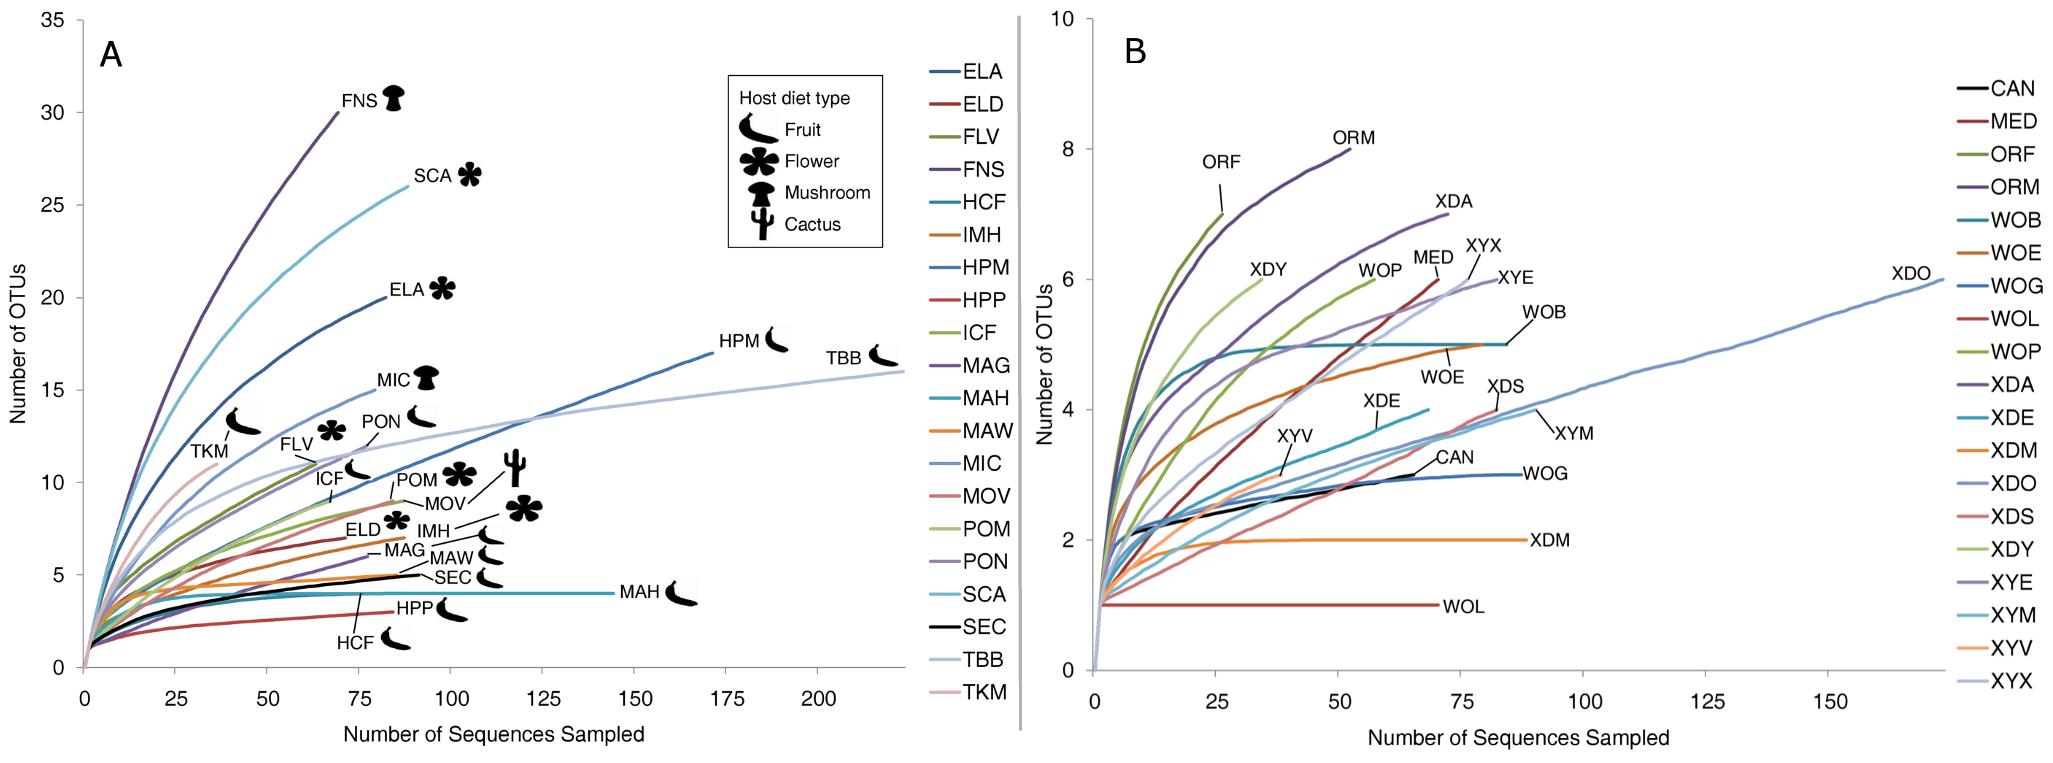 Rarefaction analysis of observed richness within <i>Drosophila</i>.